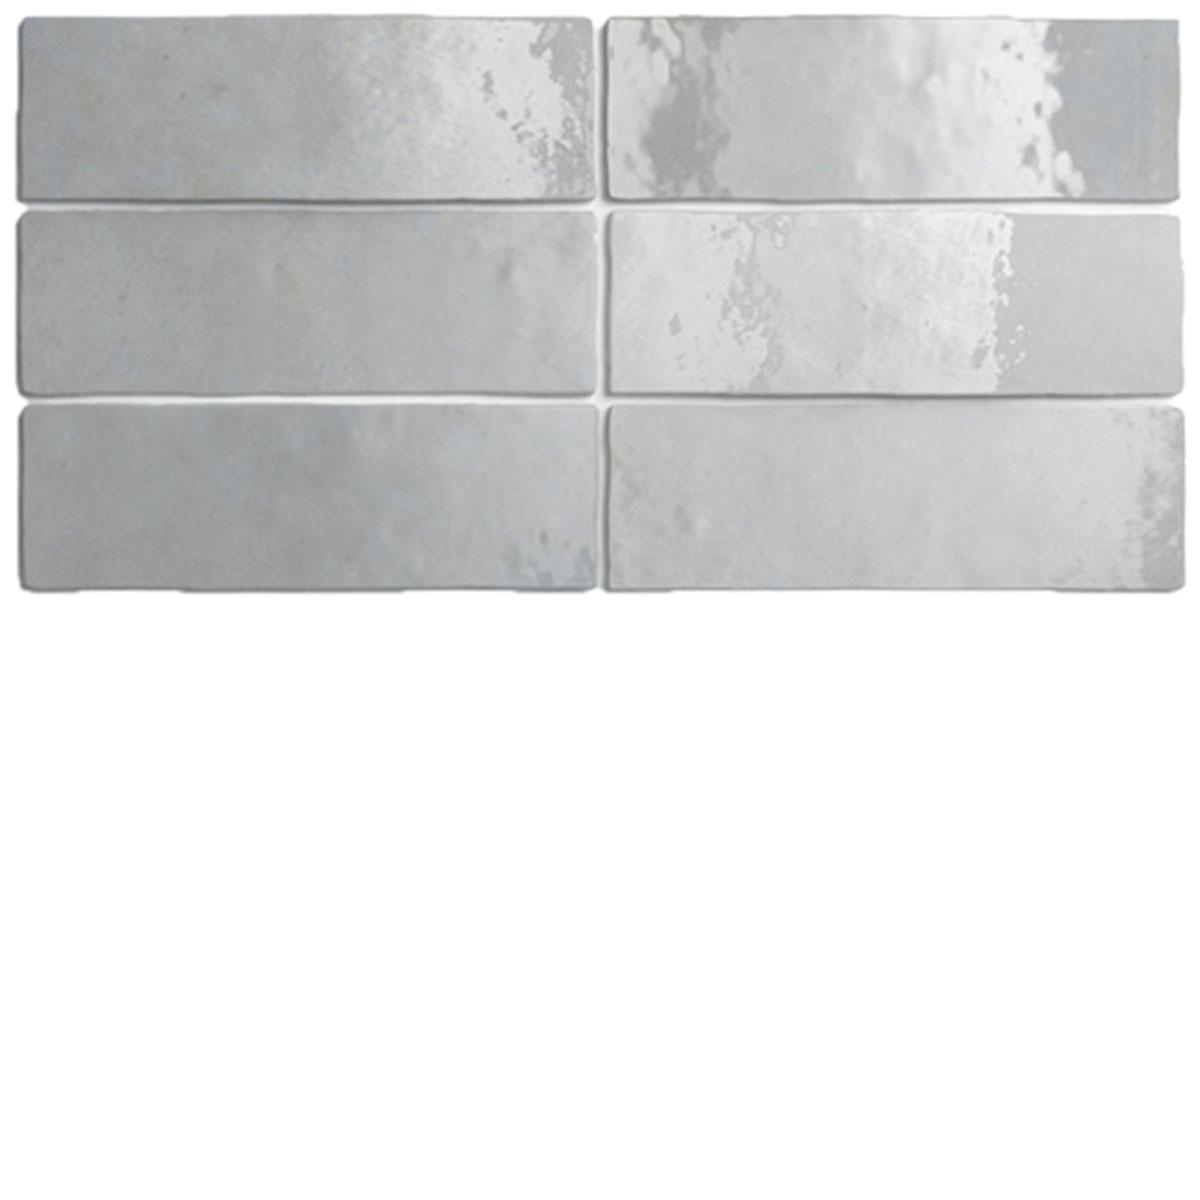 Alabaster Artisan Handmade look Rectangle Tile - Stone3 Brisbane